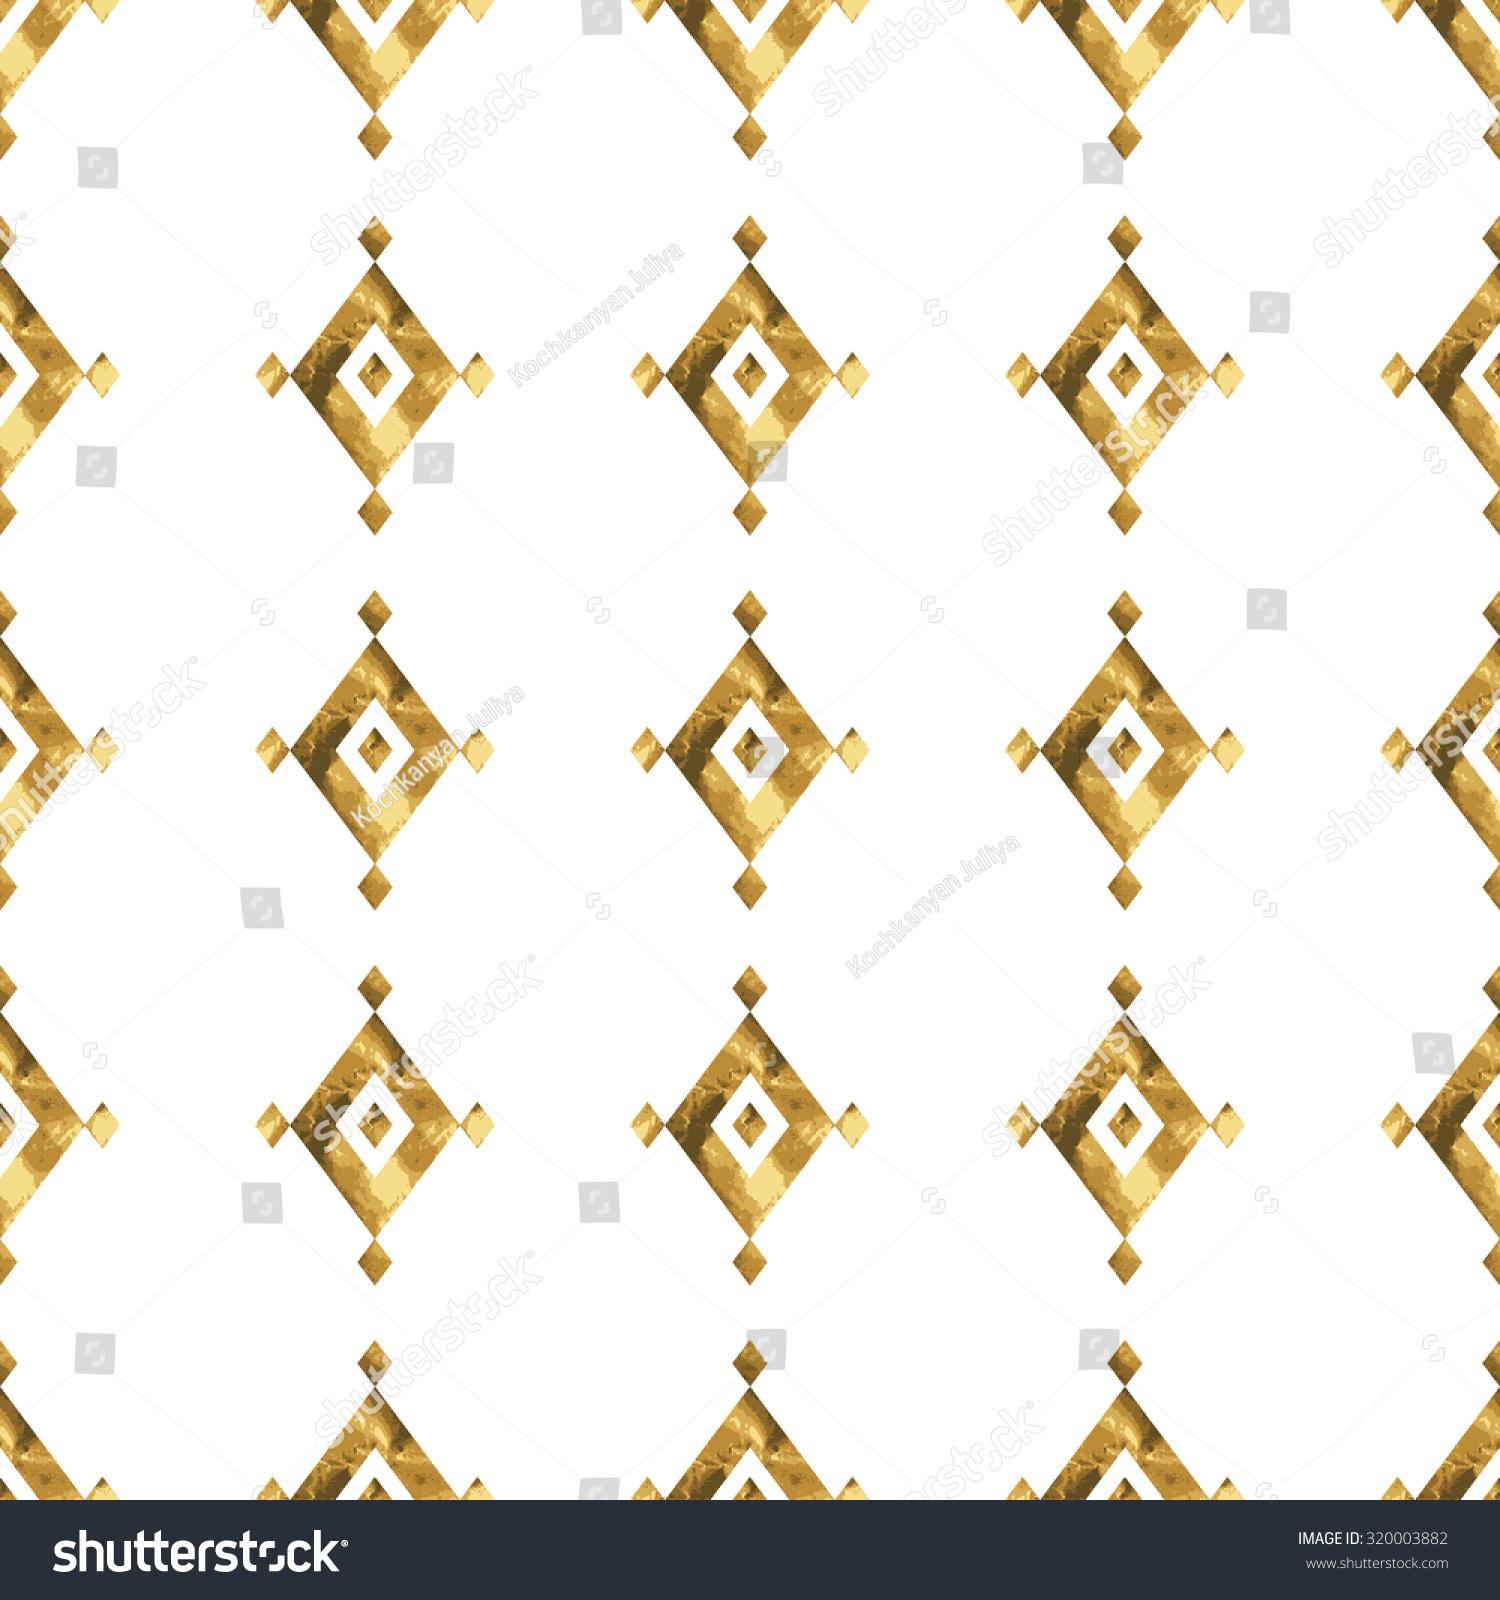 Gold Boho Bohemian Gypsy Turkish Aztec Hippie Hoop Tribal Ethnic Earrings Large